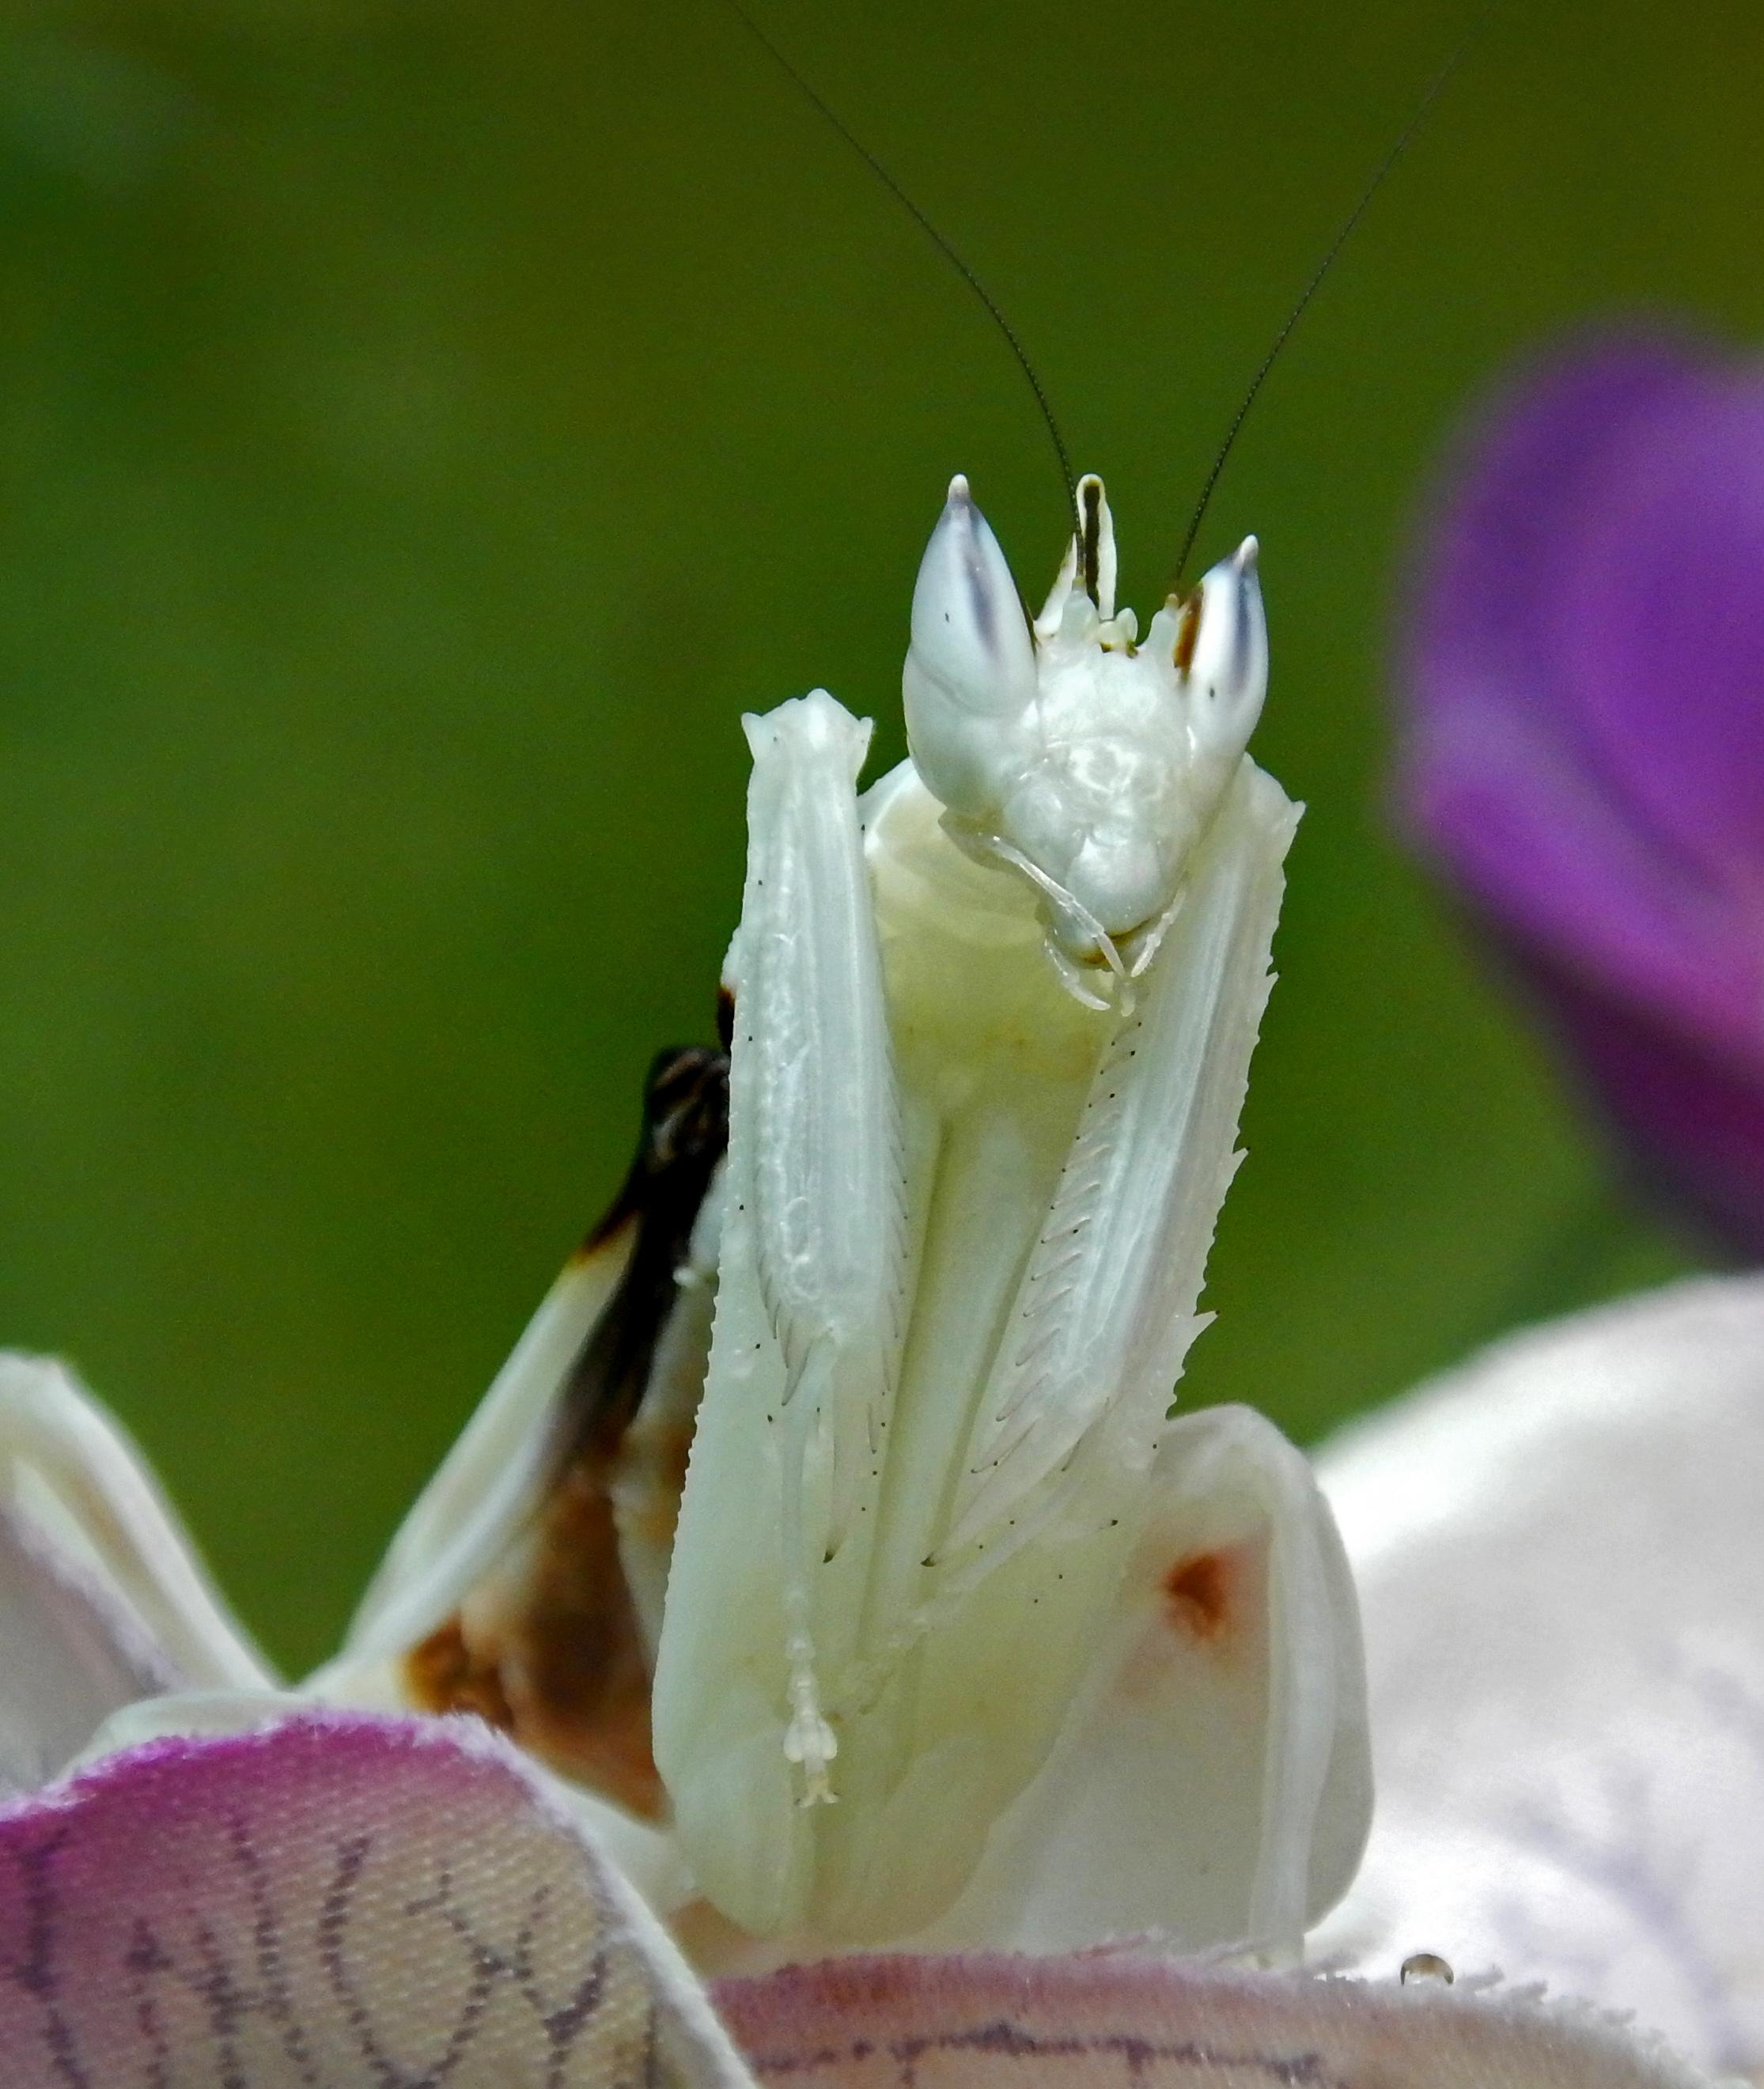 https://upload.wikimedia.org/wikipedia/commons/0/0b/Hymenopus_coronatus_Mante_orchid%C3%A9e_GLAM_MHNL_1_9.jpg